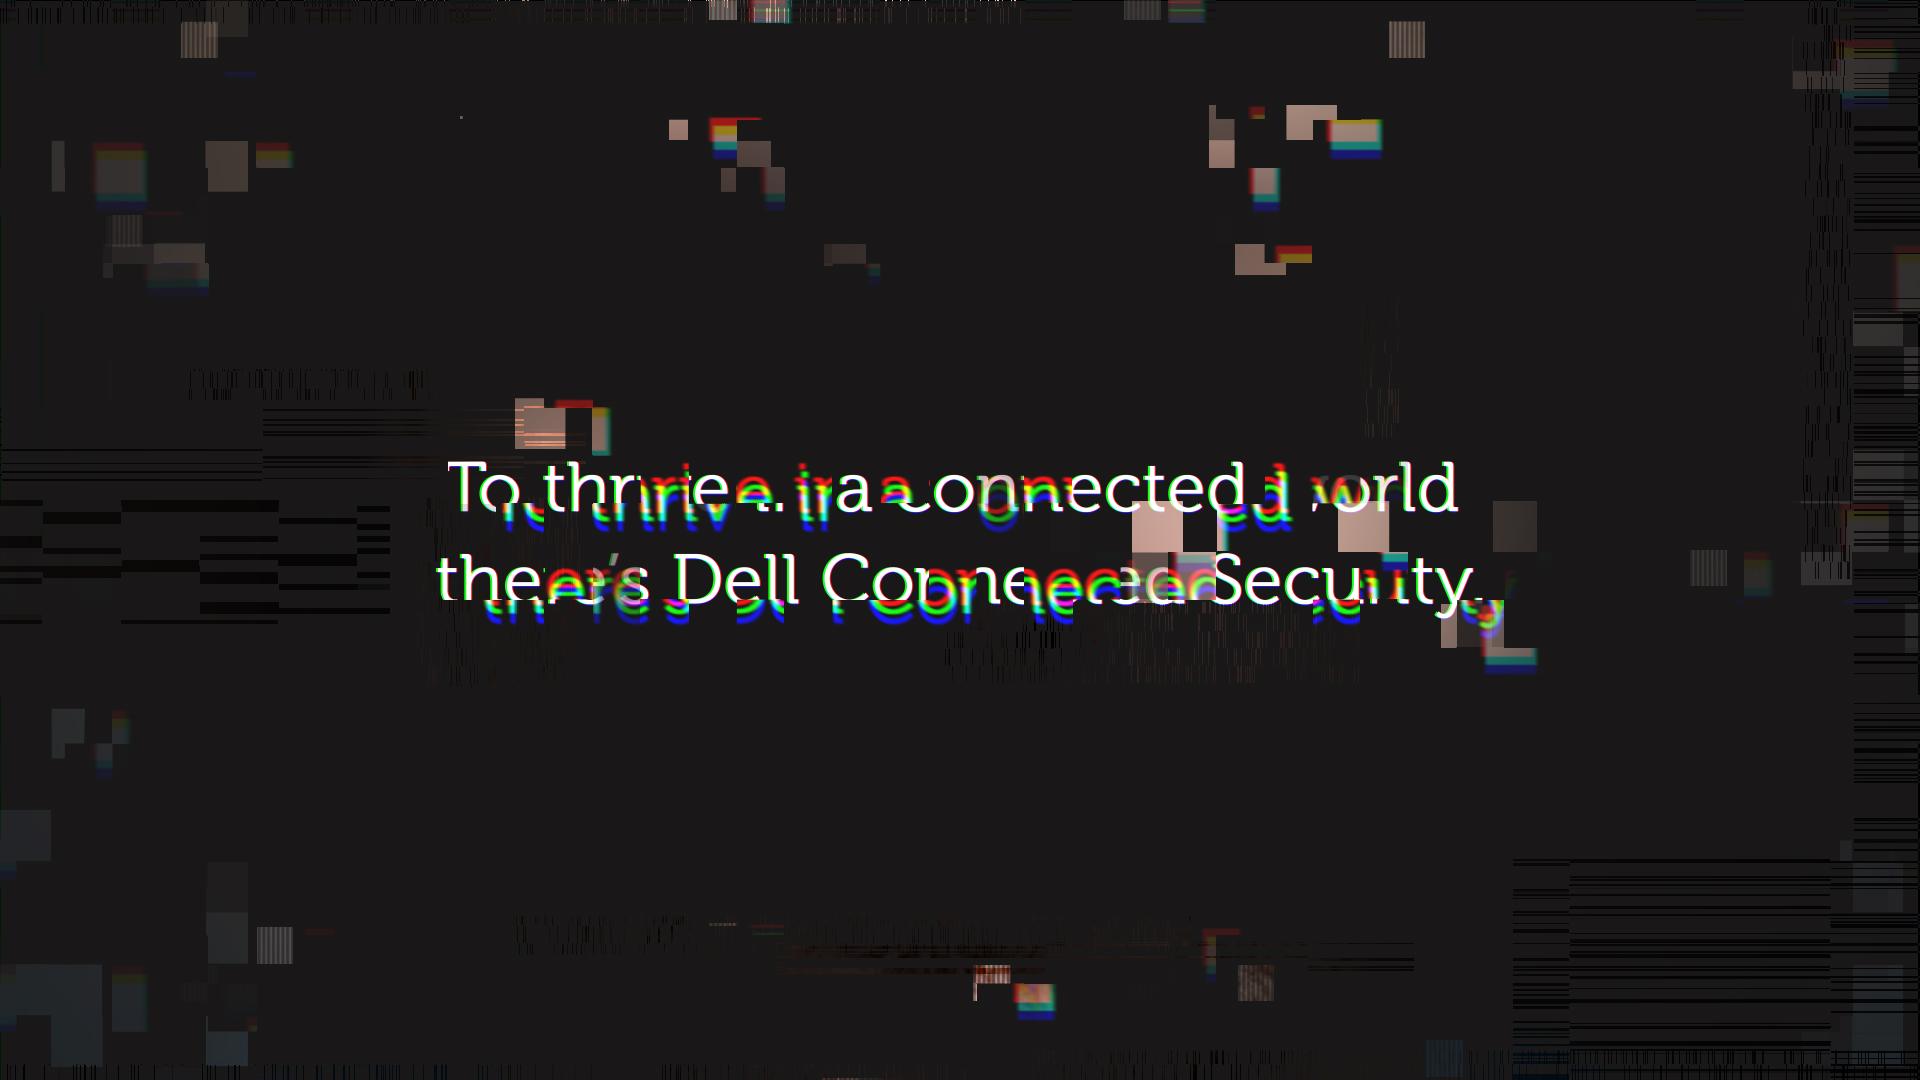 txt_card_comp_design_1.jpg